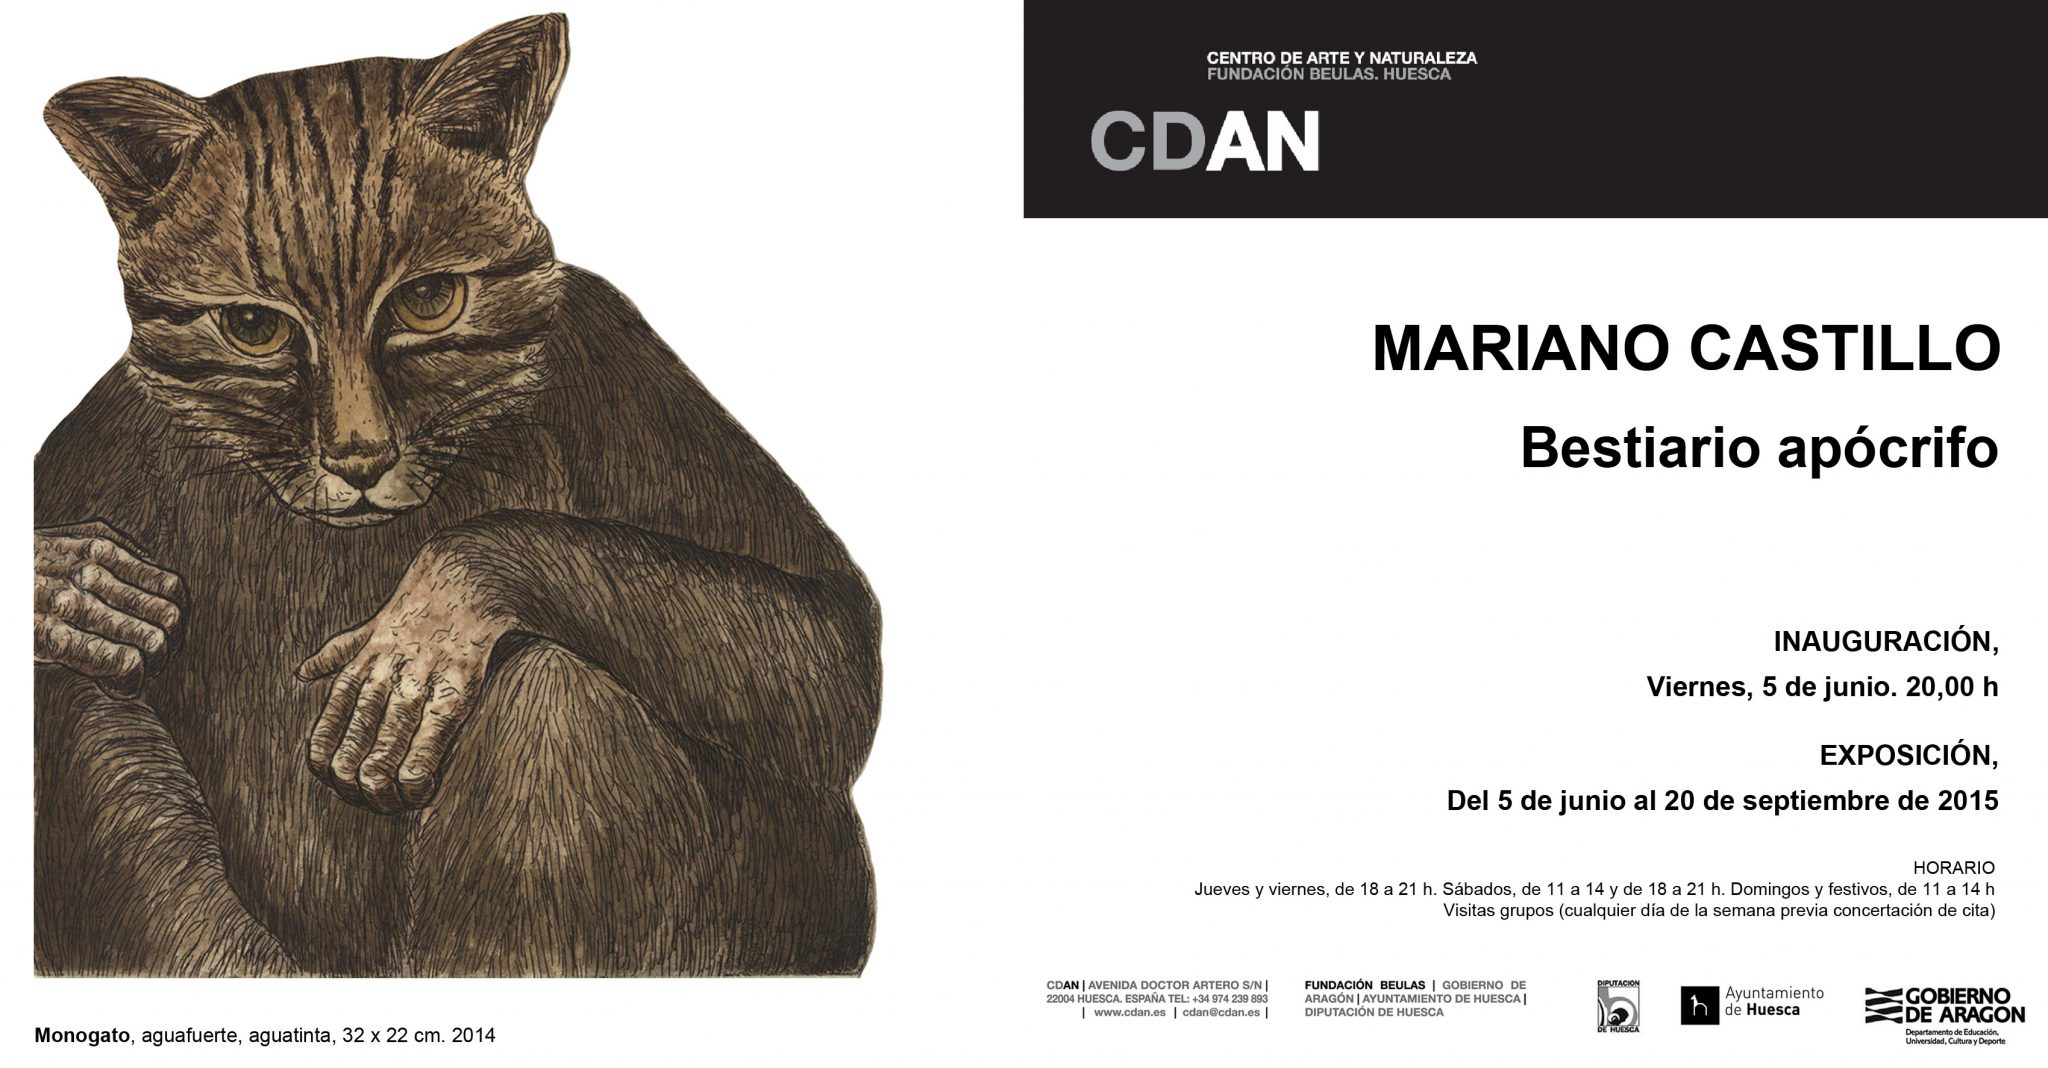 INVITACION  EXPOSICION BESTIARIO APOCRIFO - MARIANO CASTILLO - WEB